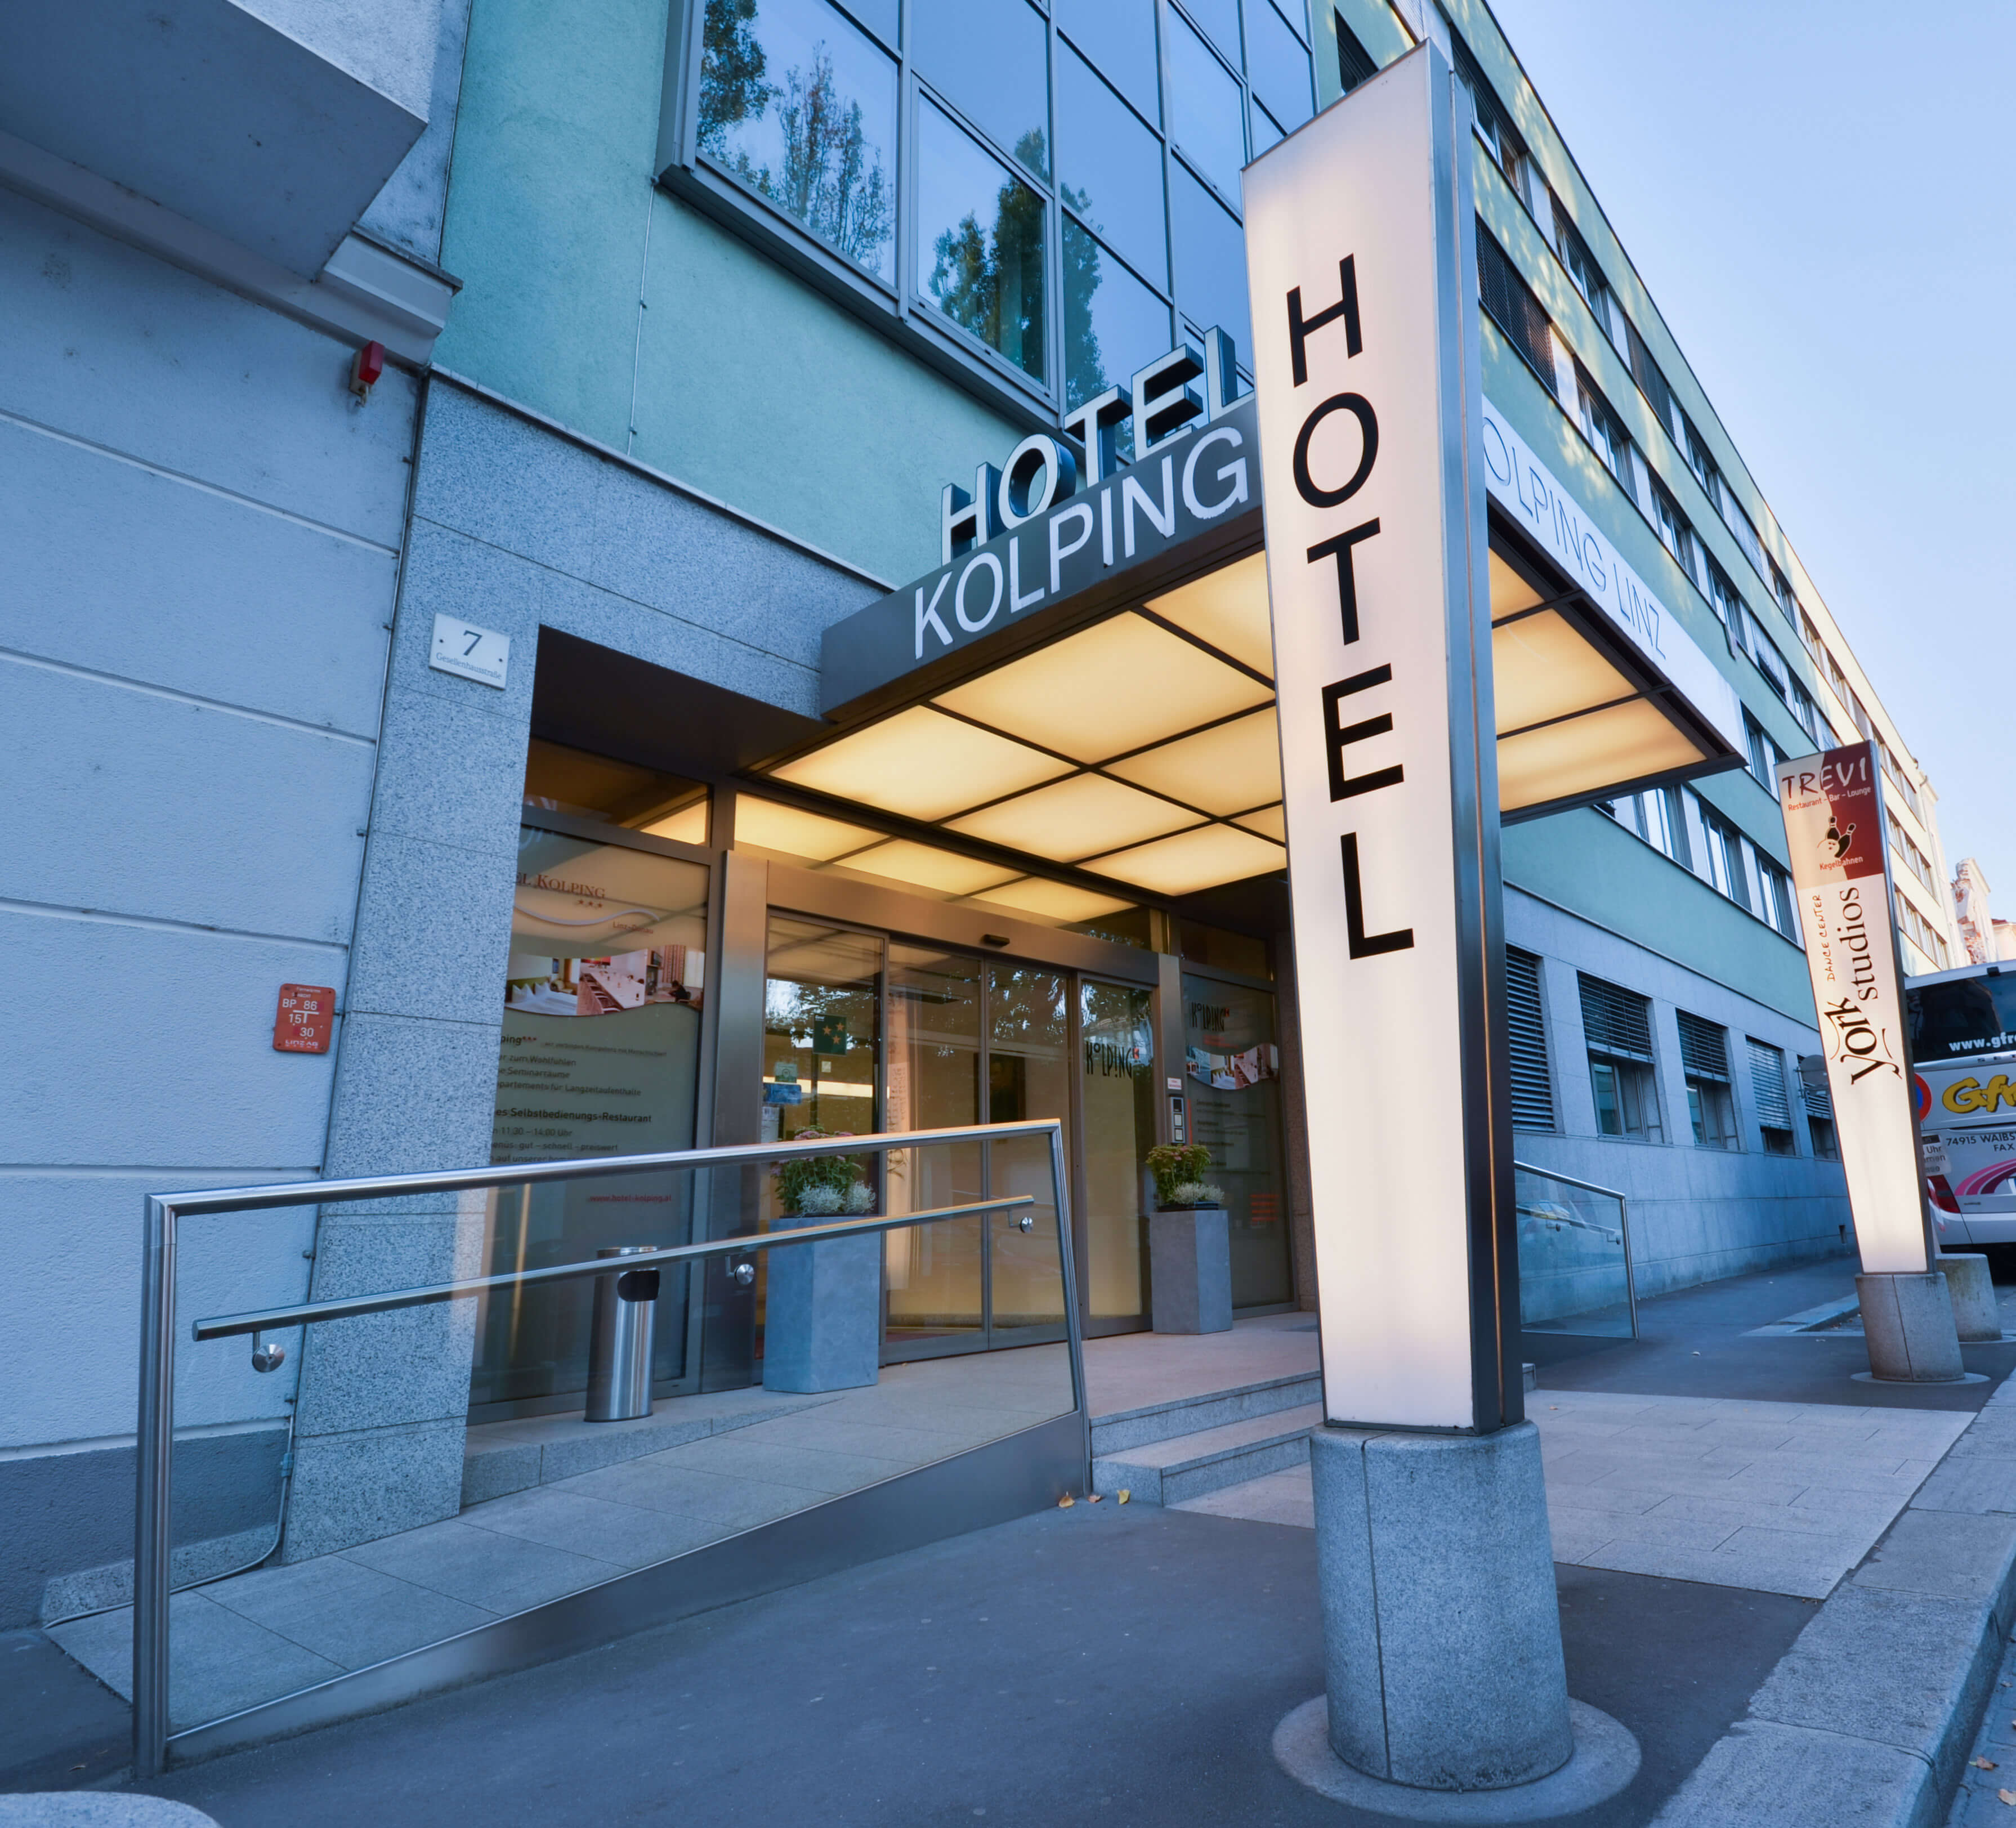 Linz: VCH By TOP Hotel Kolping